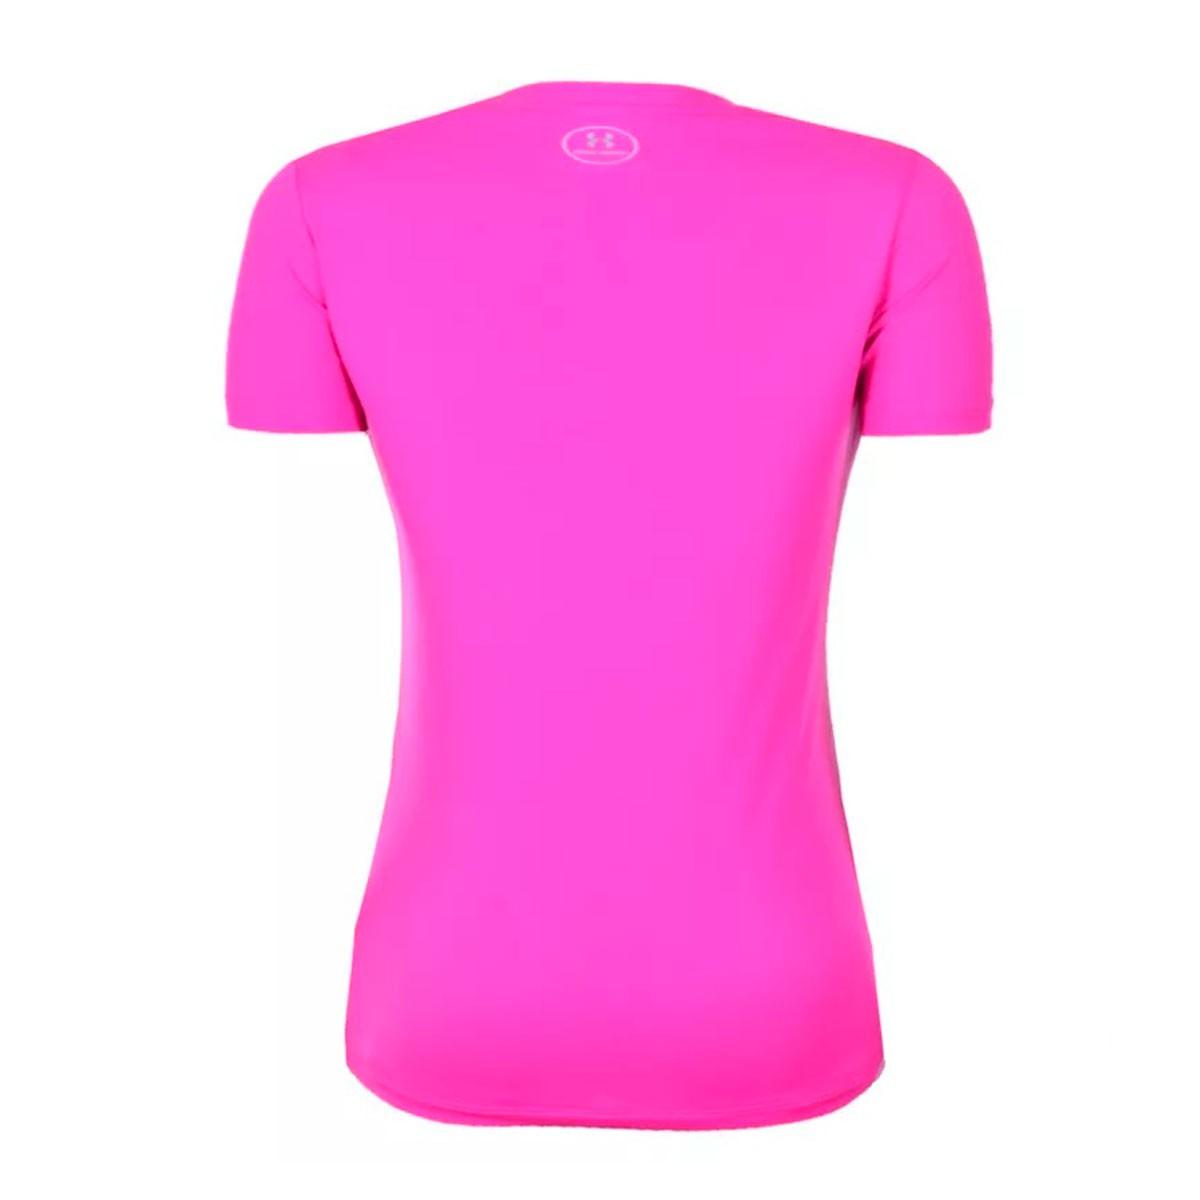 Camiseta Under Armour Tech Feminino Rosa